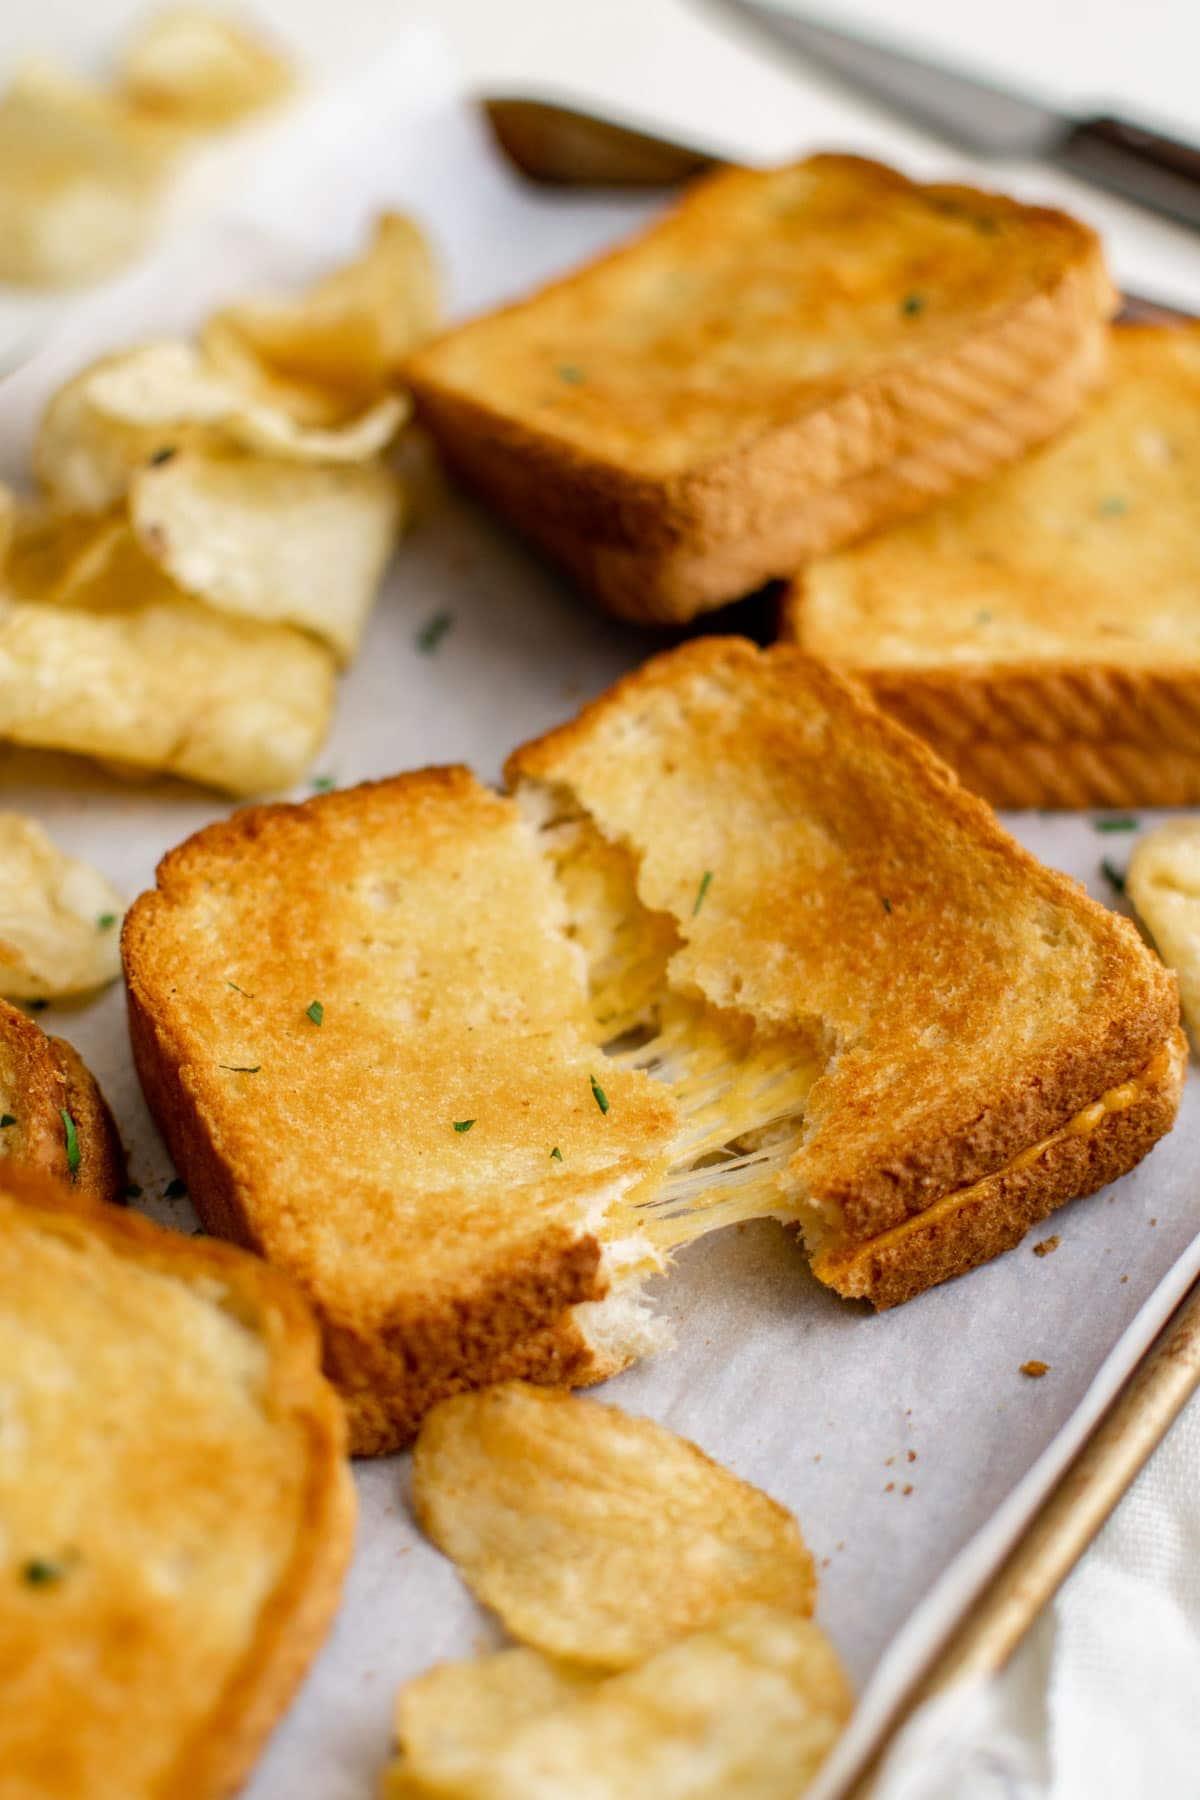 baking sheet, cheese sandwiches, potato chips